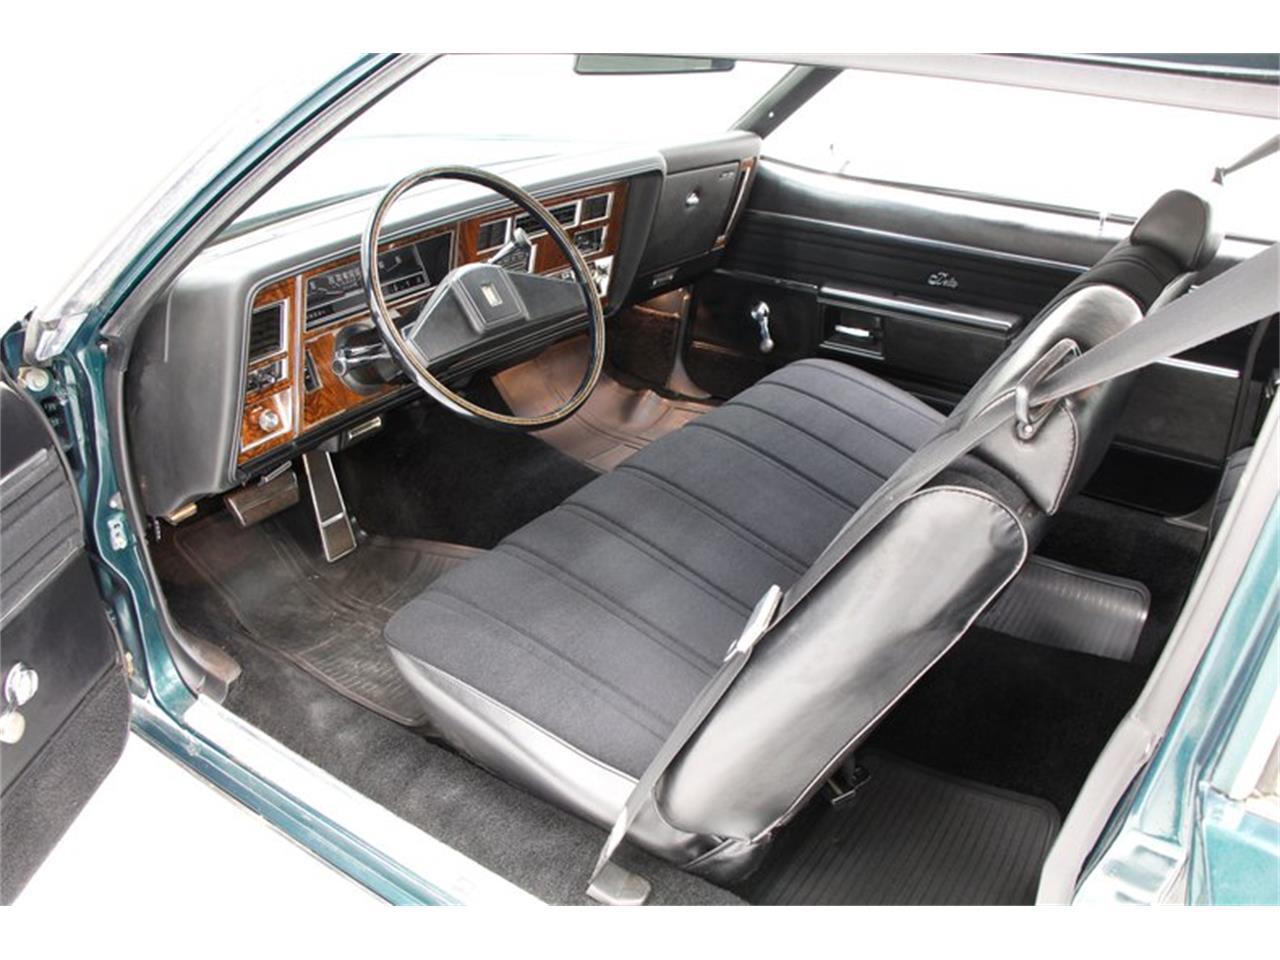 1977 Oldsmobile Delta 88 (CC-1334027) for sale in Morgantown, Pennsylvania